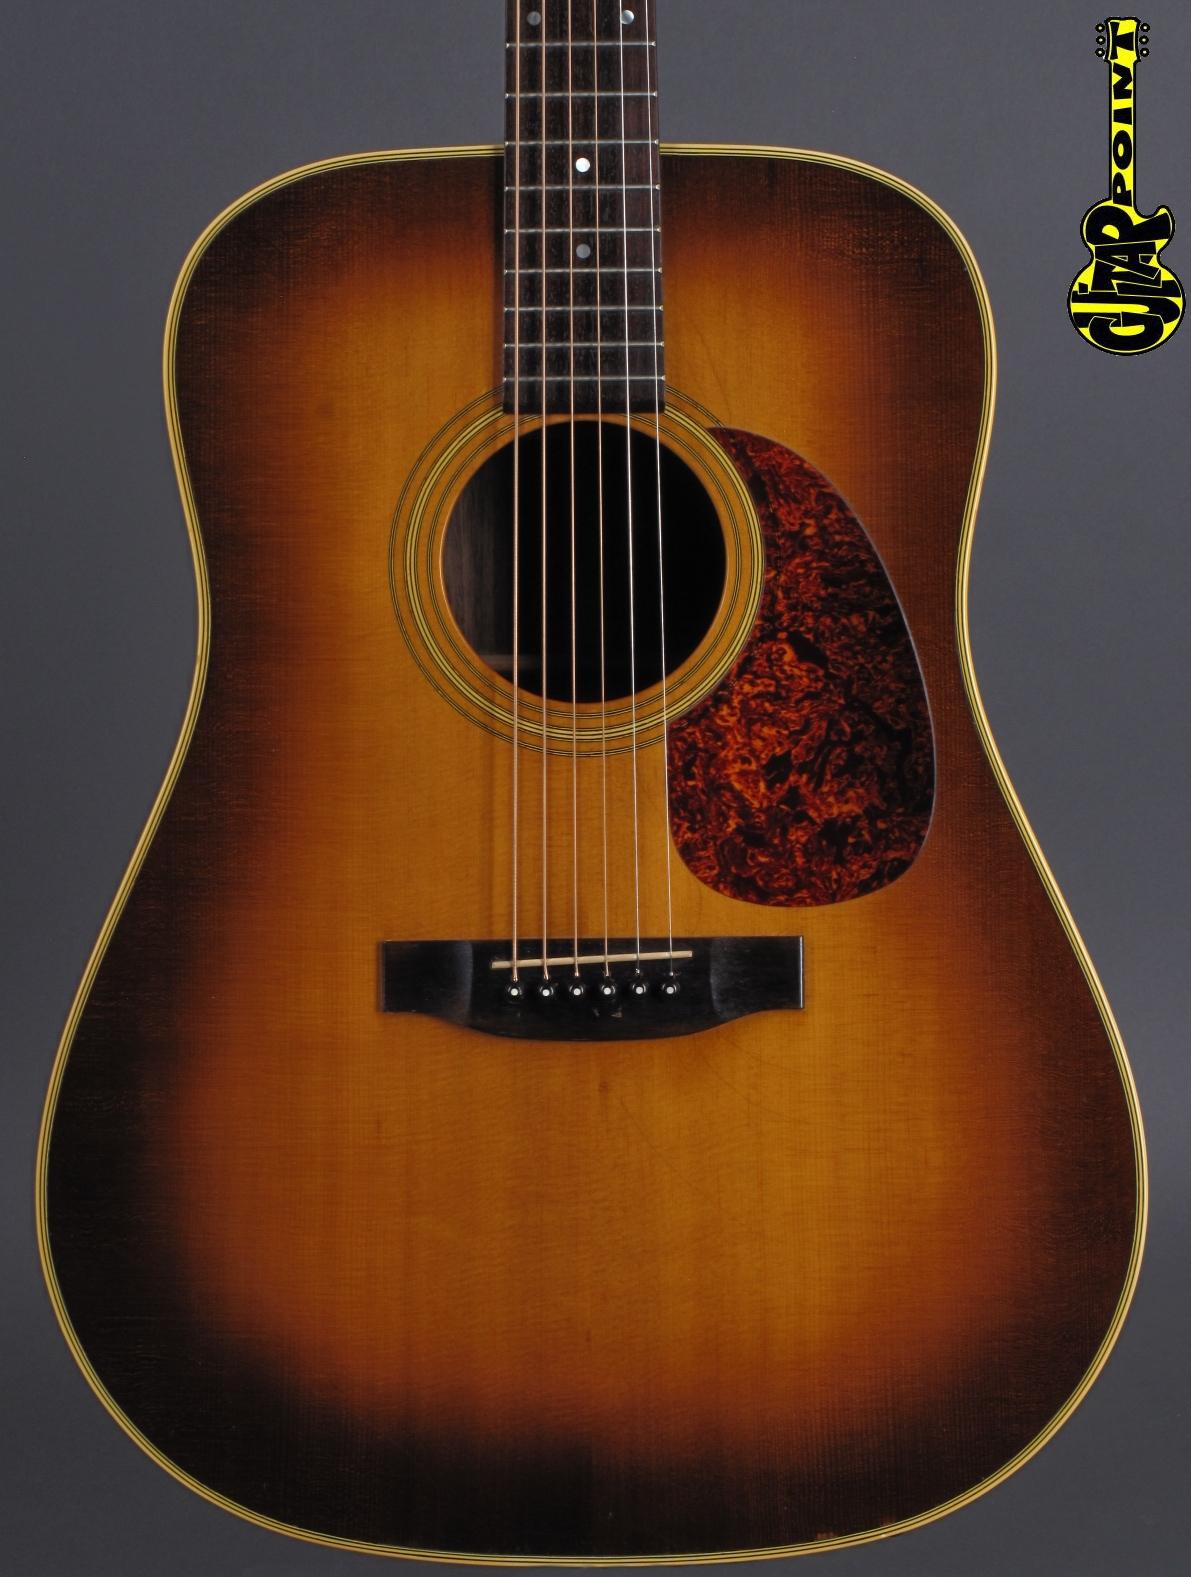 1987 Martin D-2832 Shenandoah - Sunburst